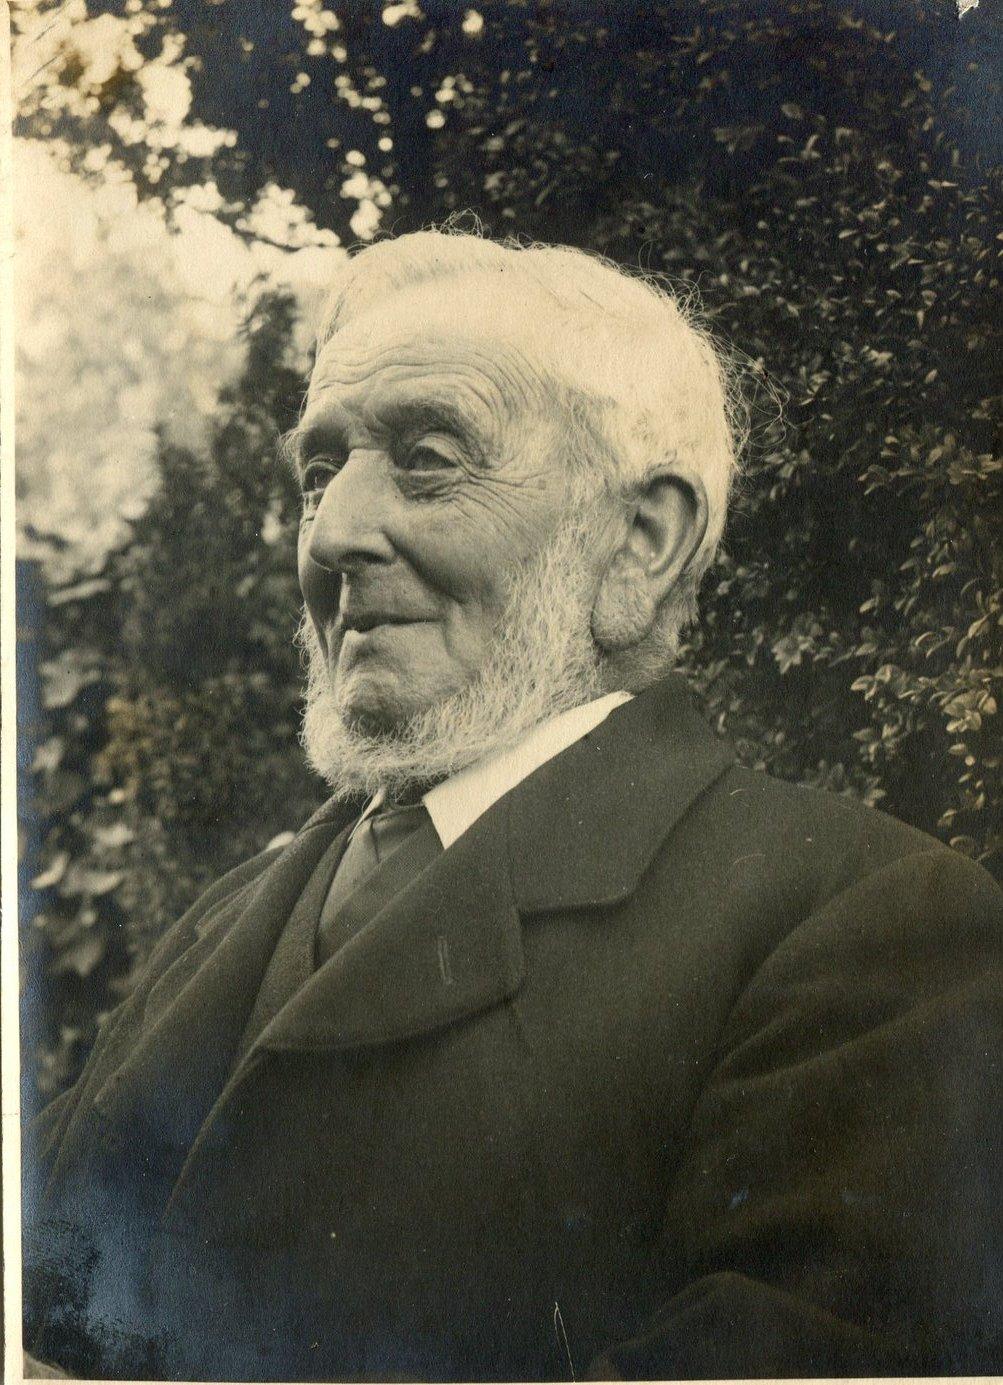 Henry Fairweather